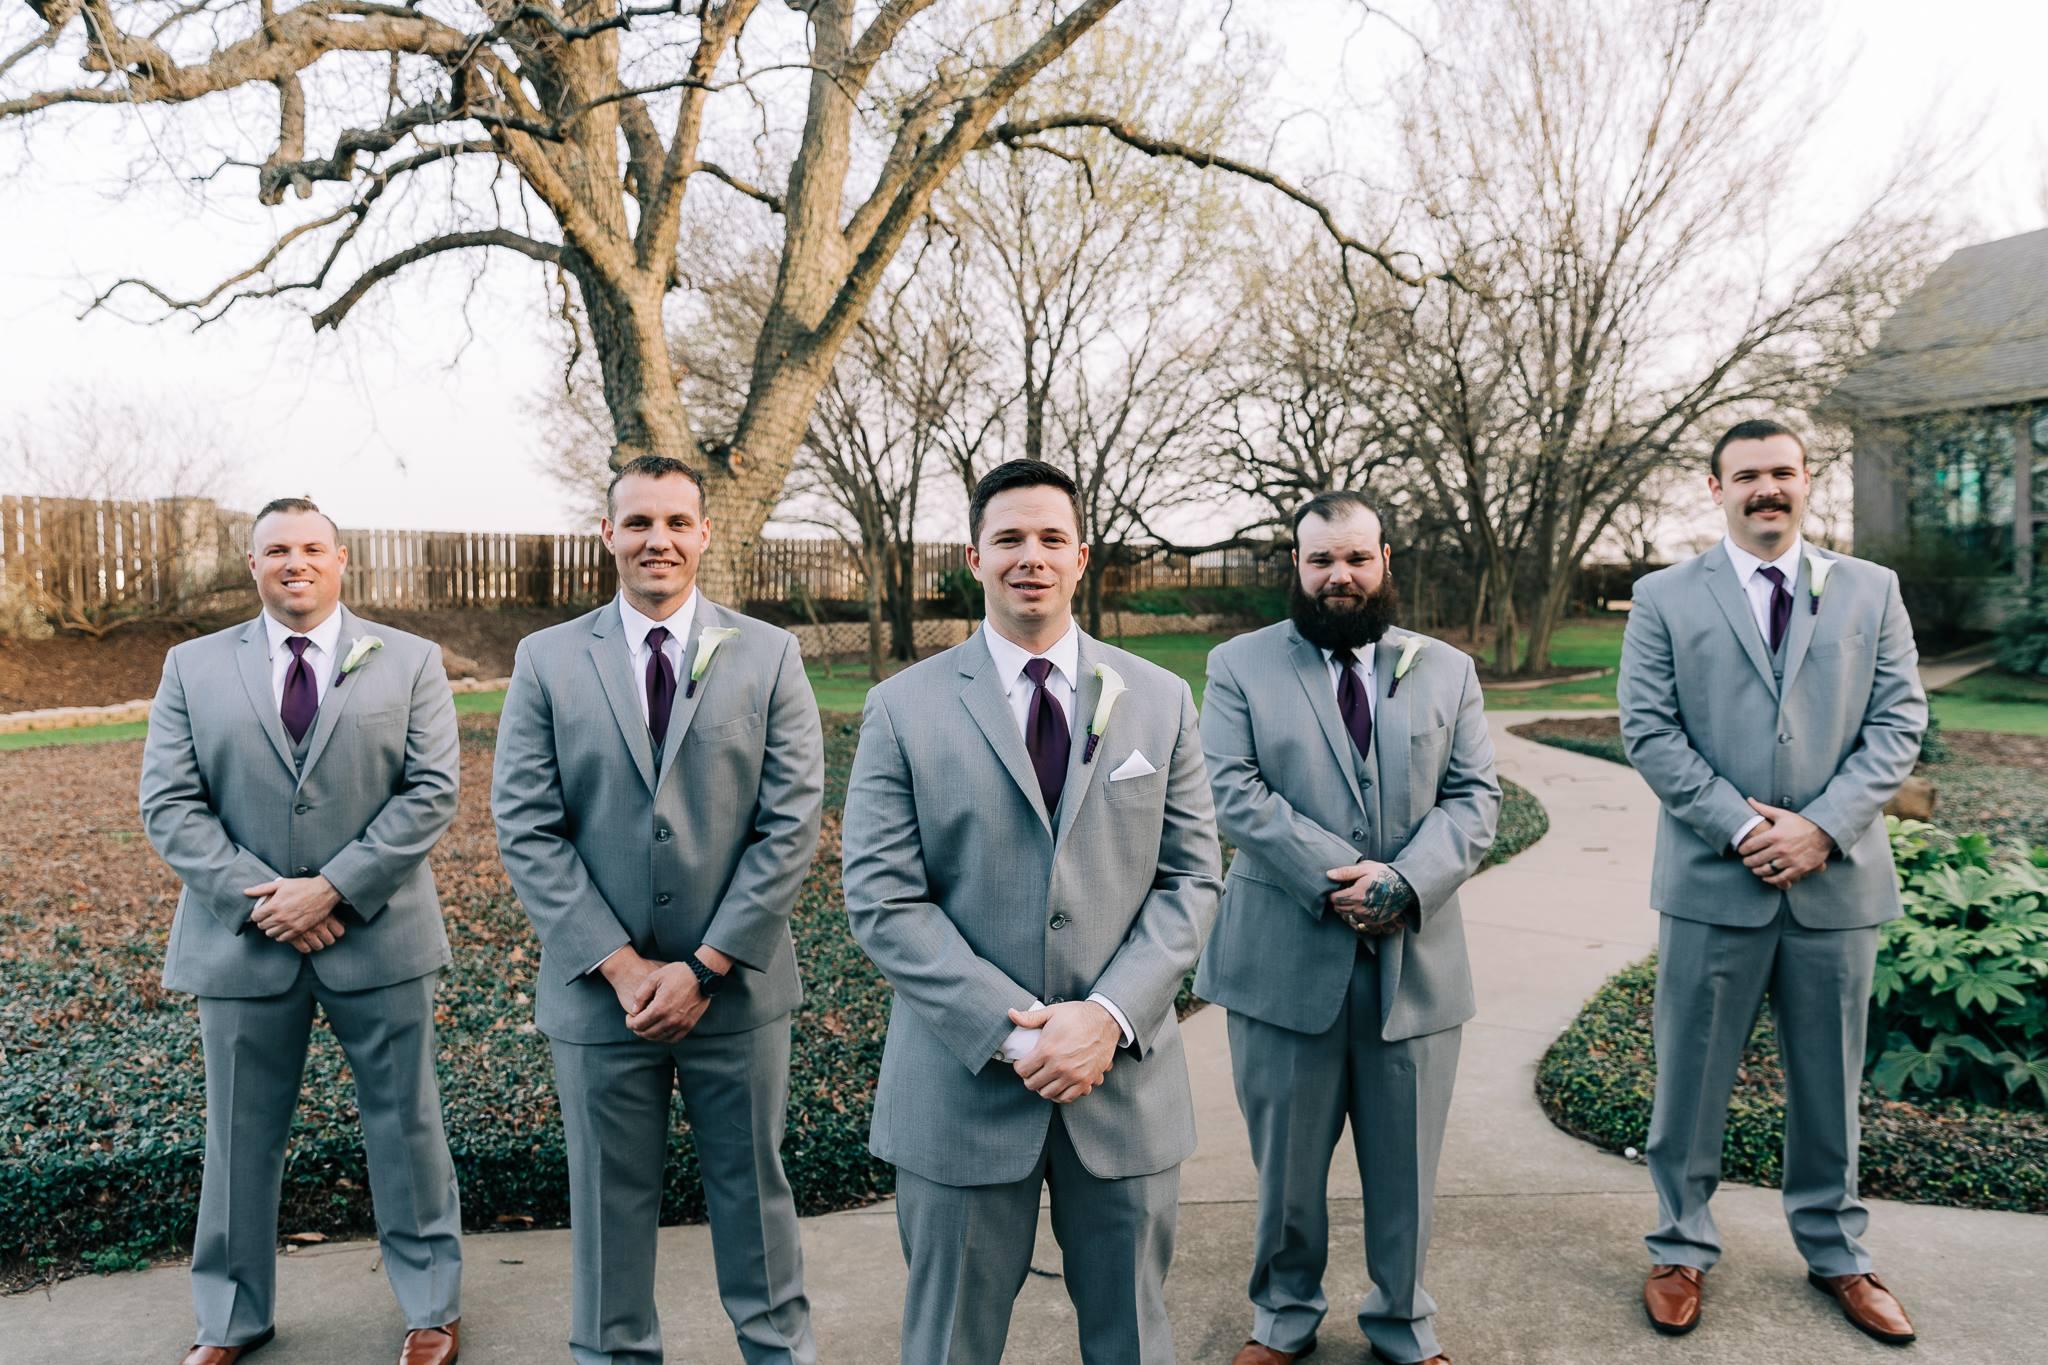 Aubrey-Texas-Harmony-Chapel-Wedding-Florist-David-Co.-19.jpg